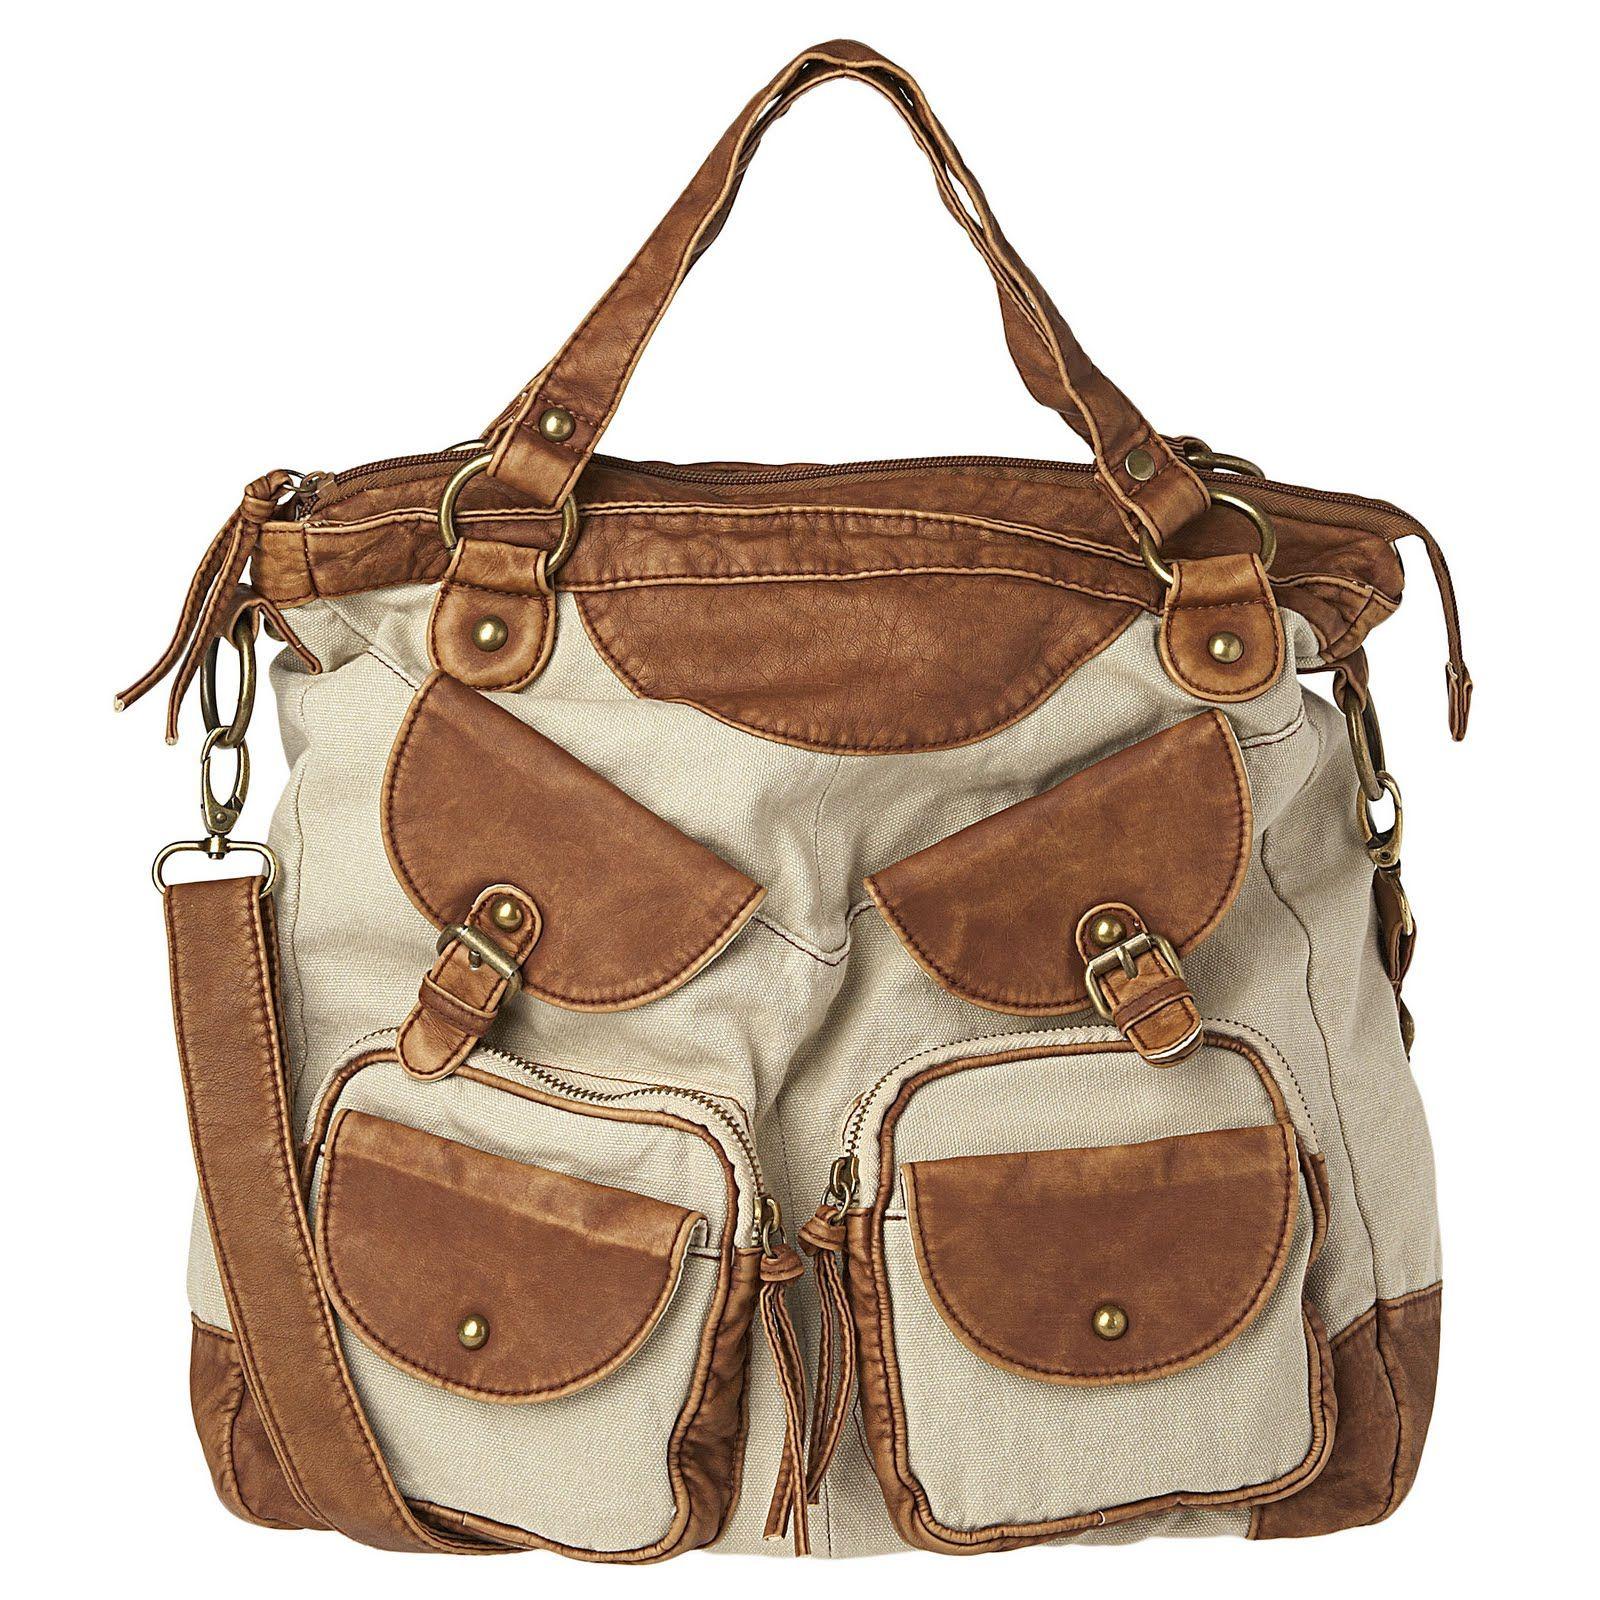 2017 Designer Handbags On